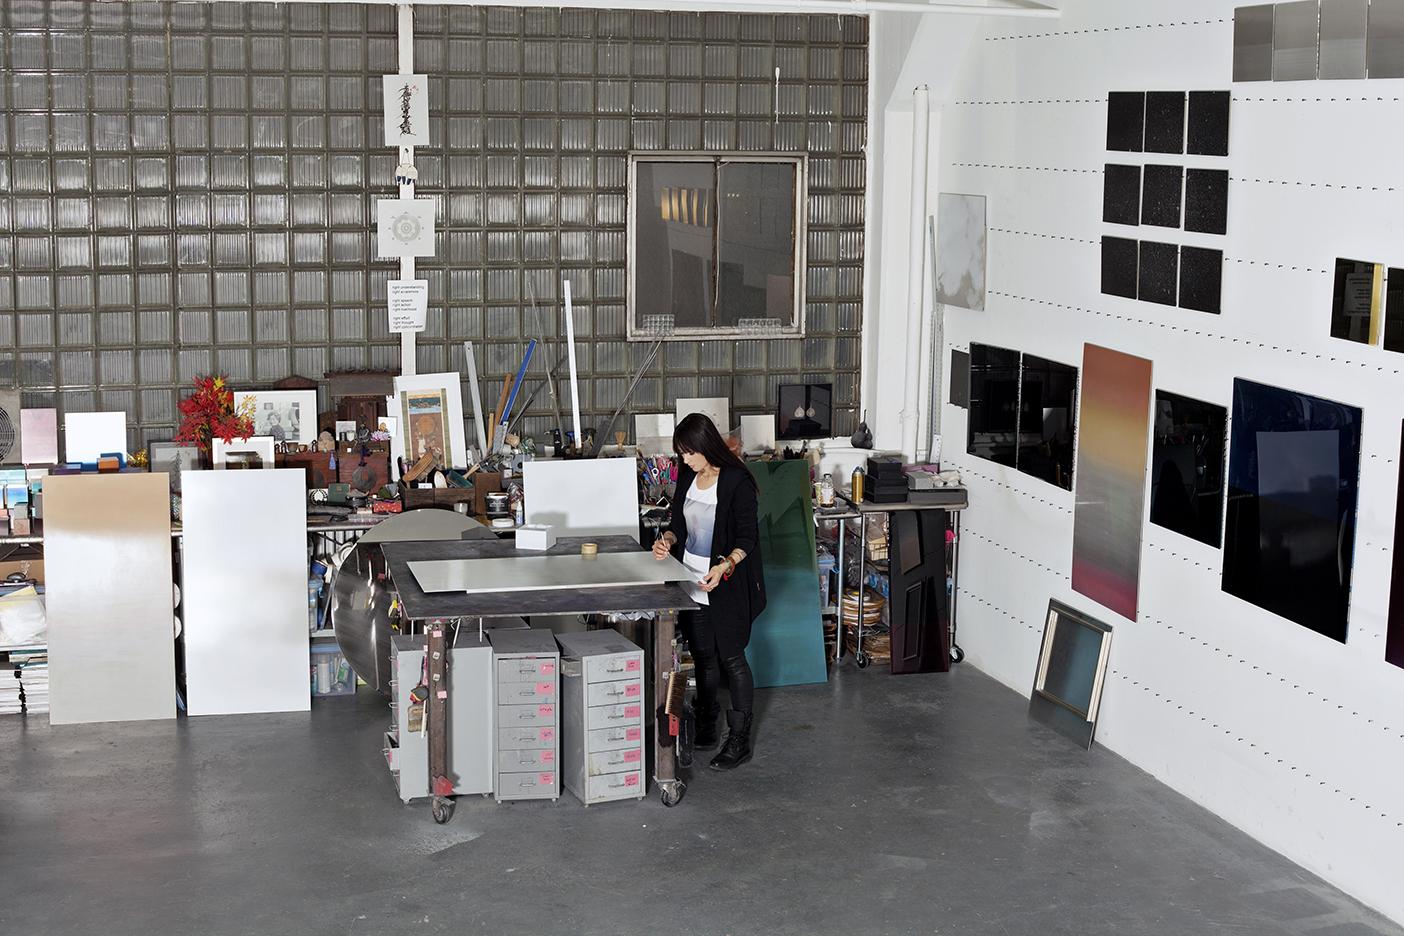 Image: Miya Ando in her studio, New York. Photo: Lorraine Young.